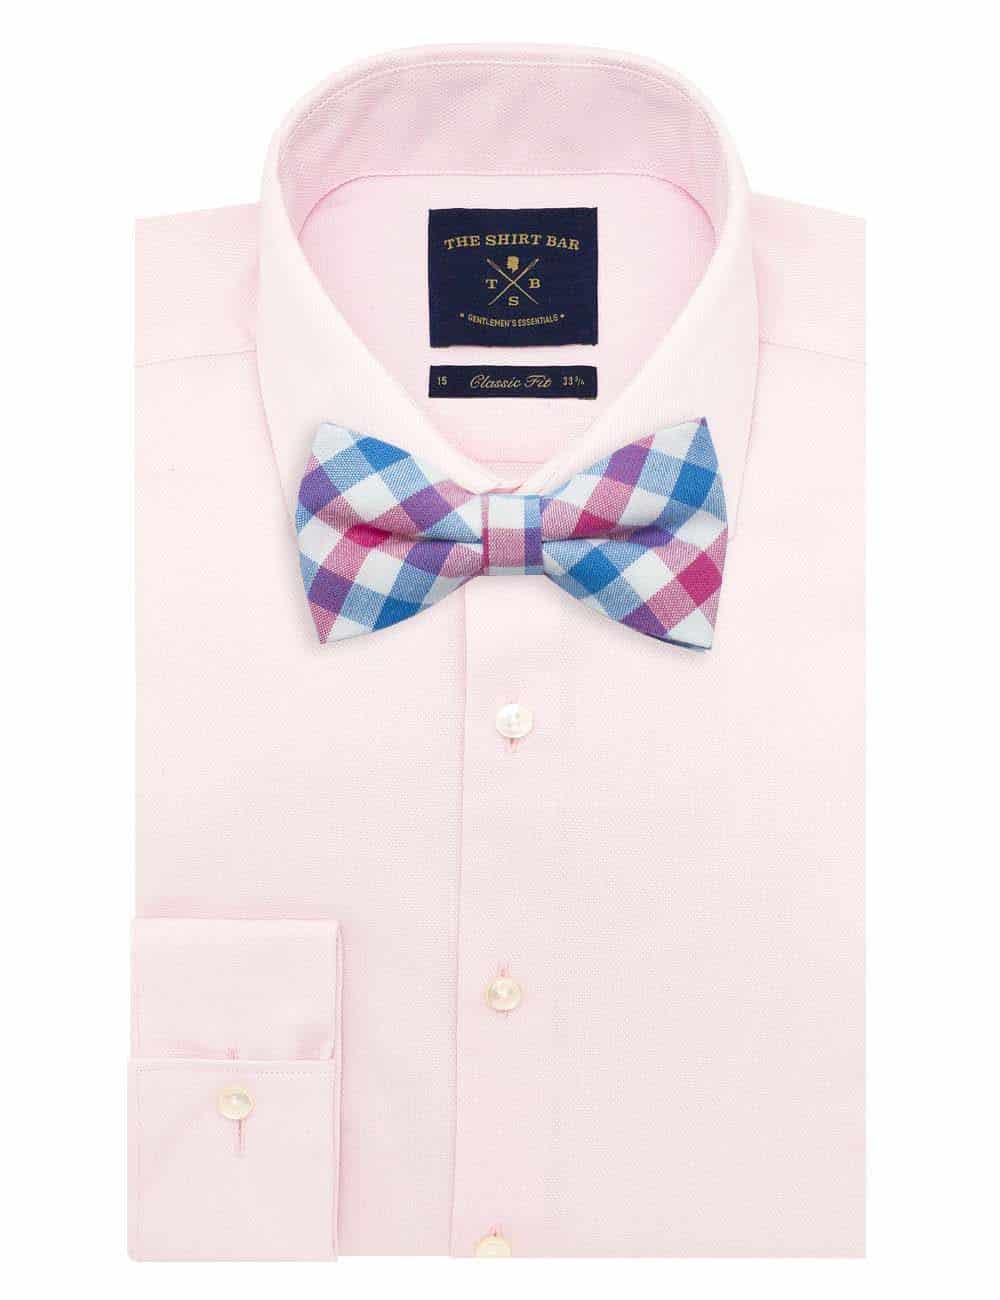 White/ Blue/ Pink Checks Woven Bowtie WBT51.8